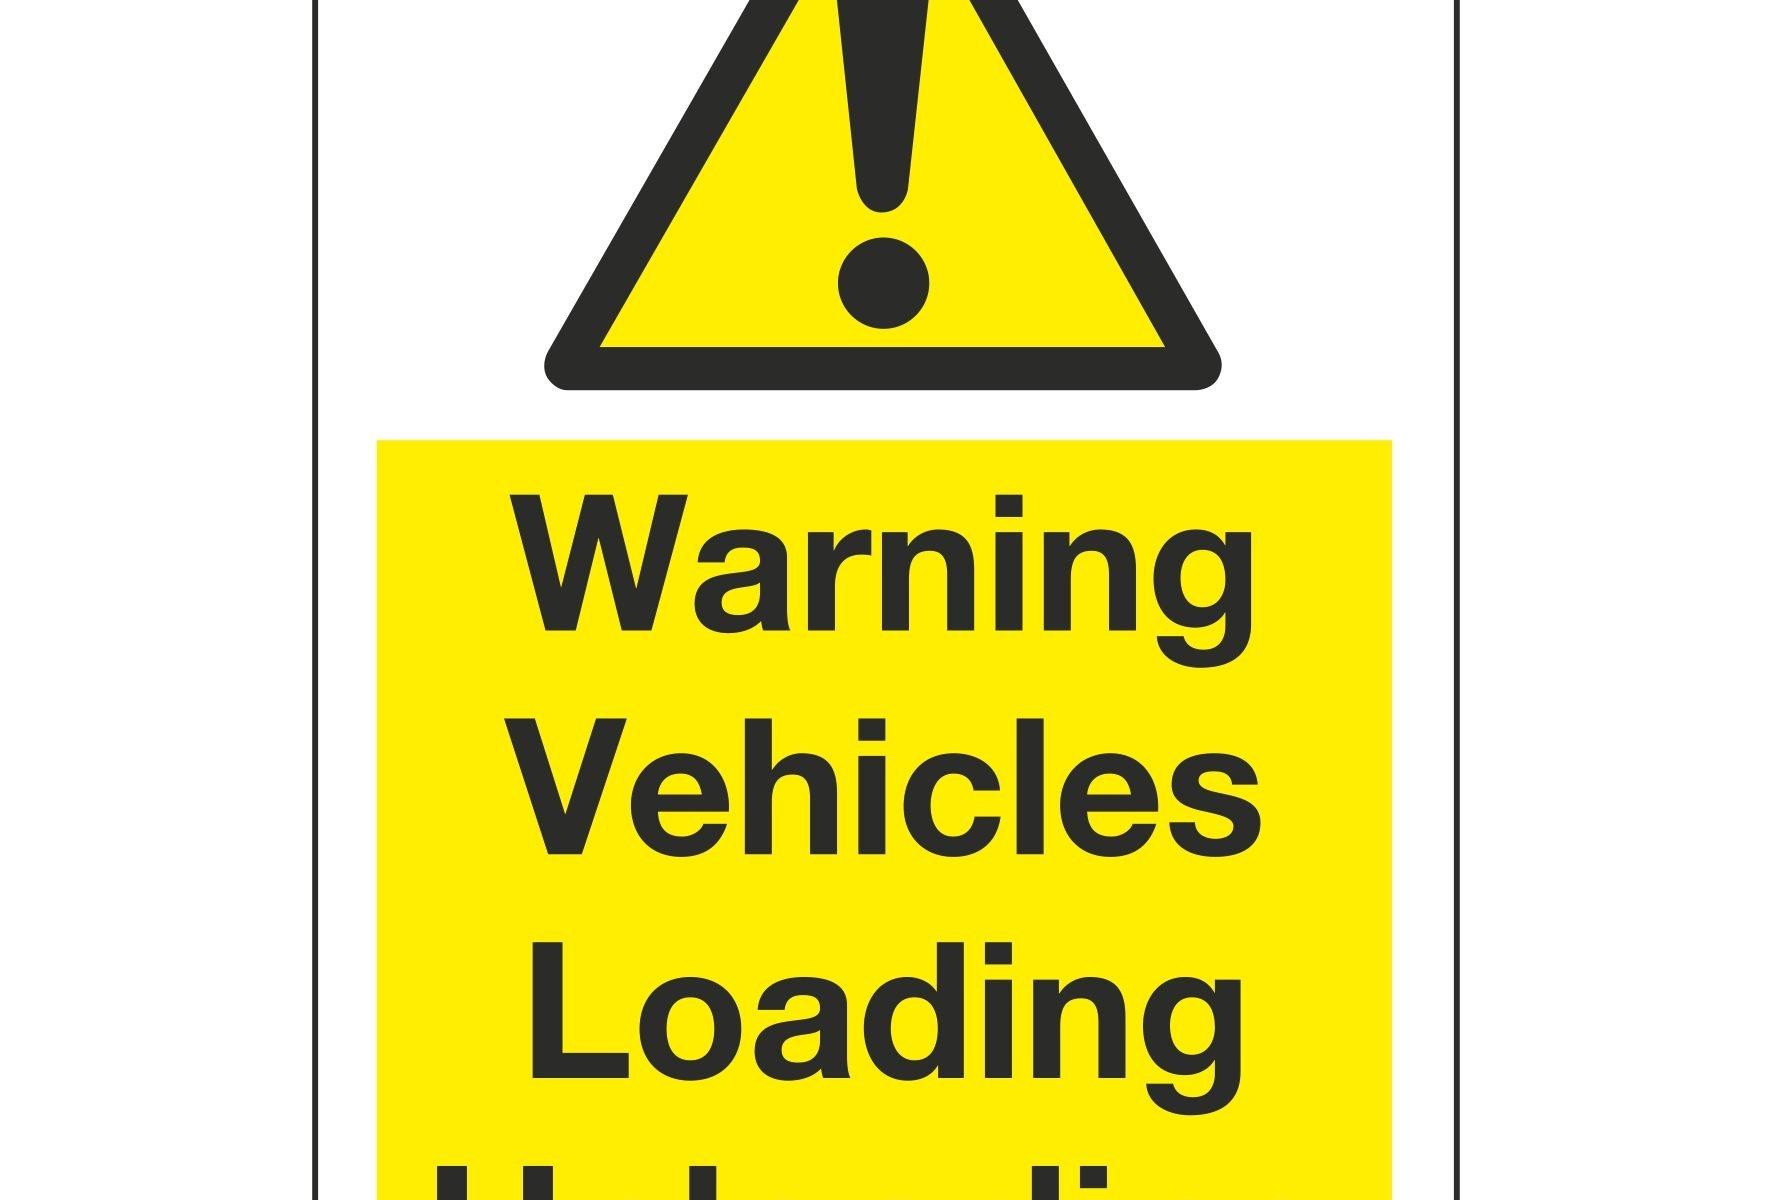 Warning Vehicles Loading Unloading